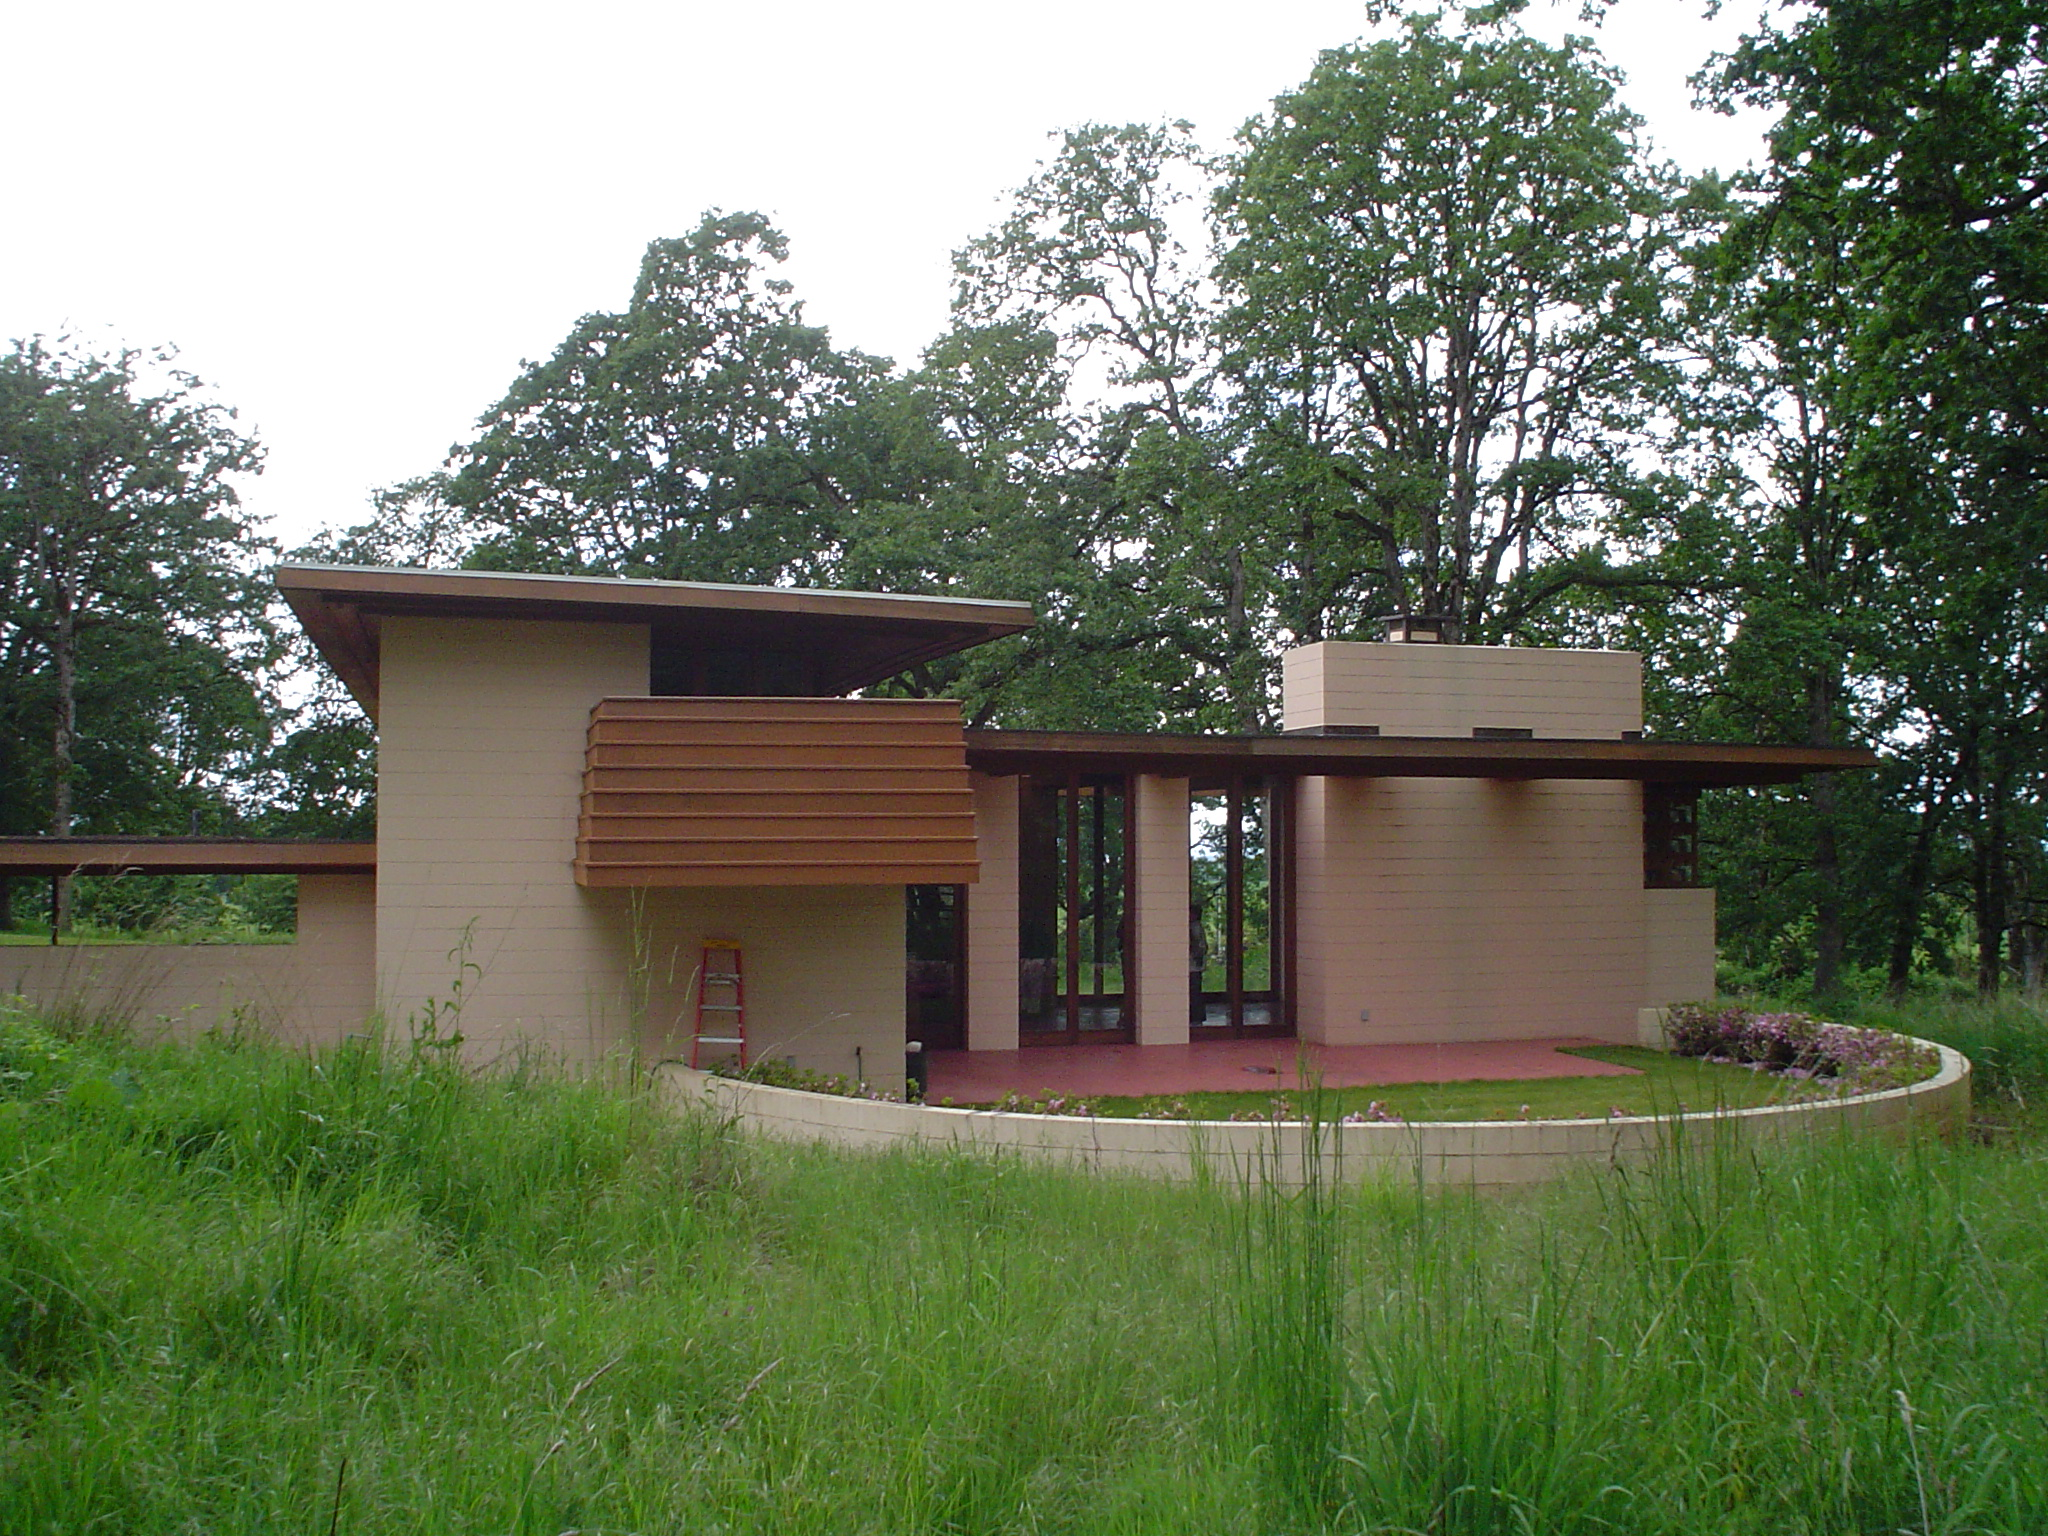 FileGordon House North Side 1jpg Wikimedia Commons